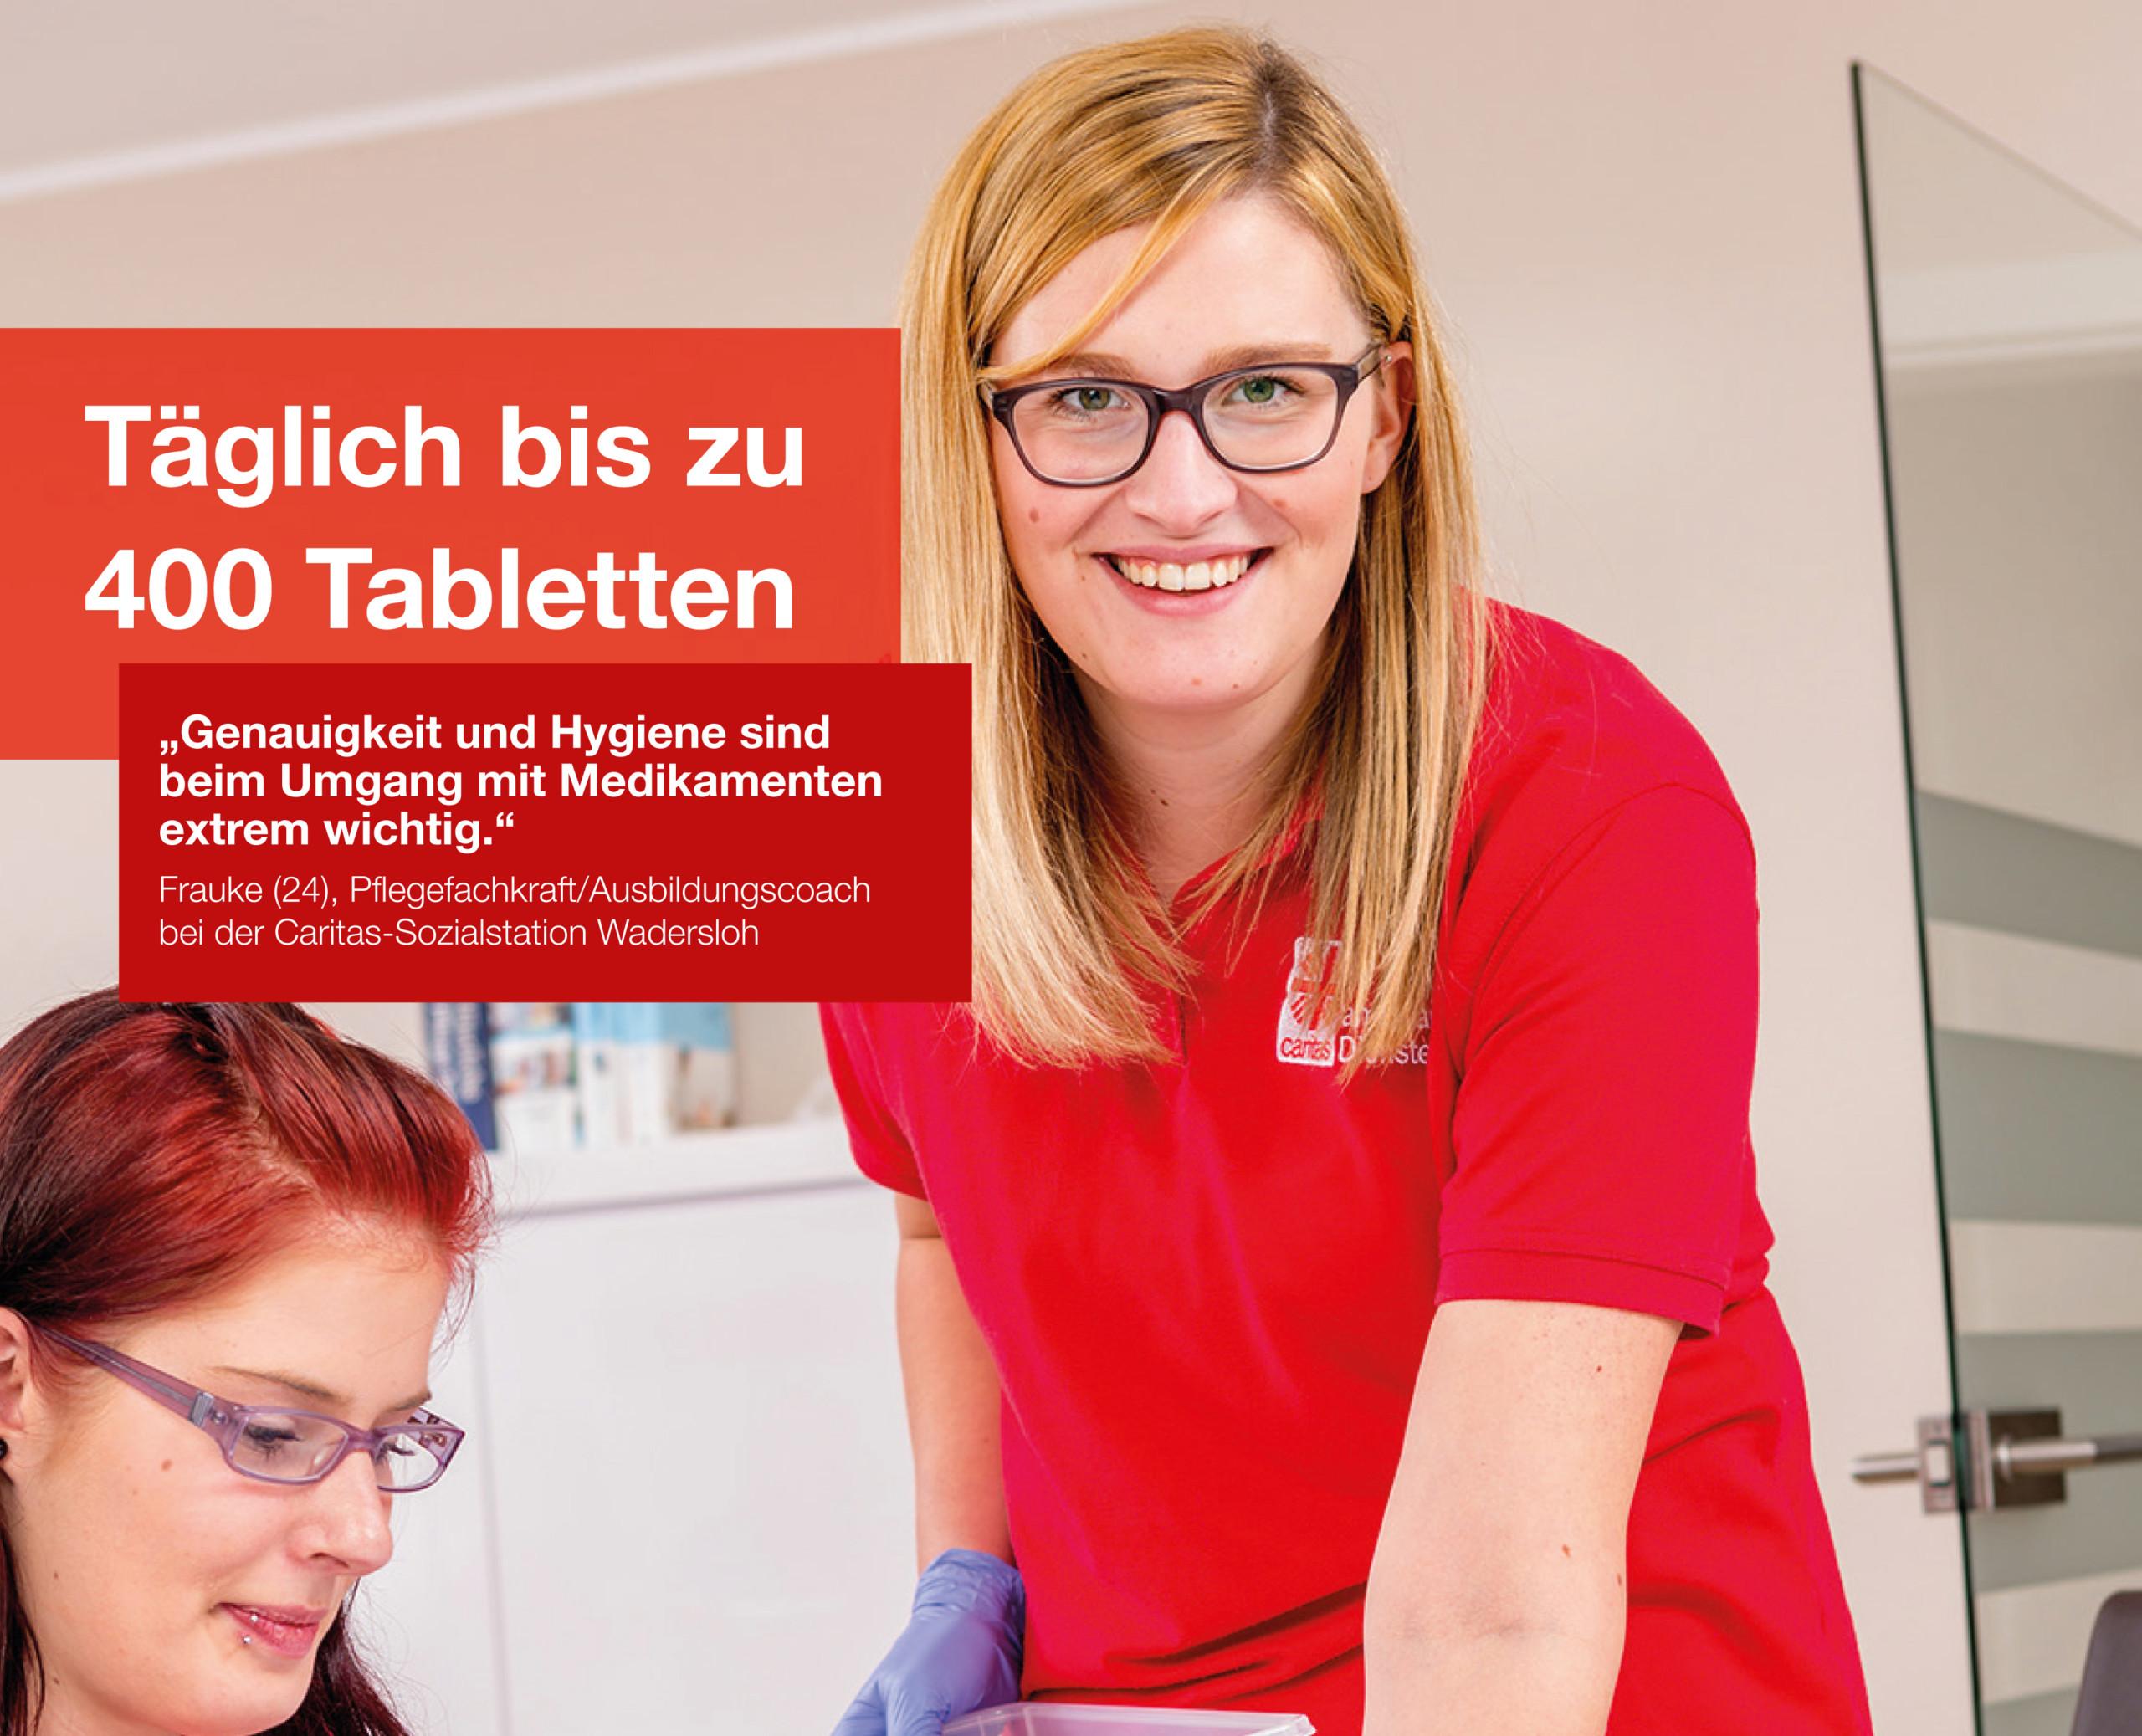 Caritas ambulante Dienste GmbH